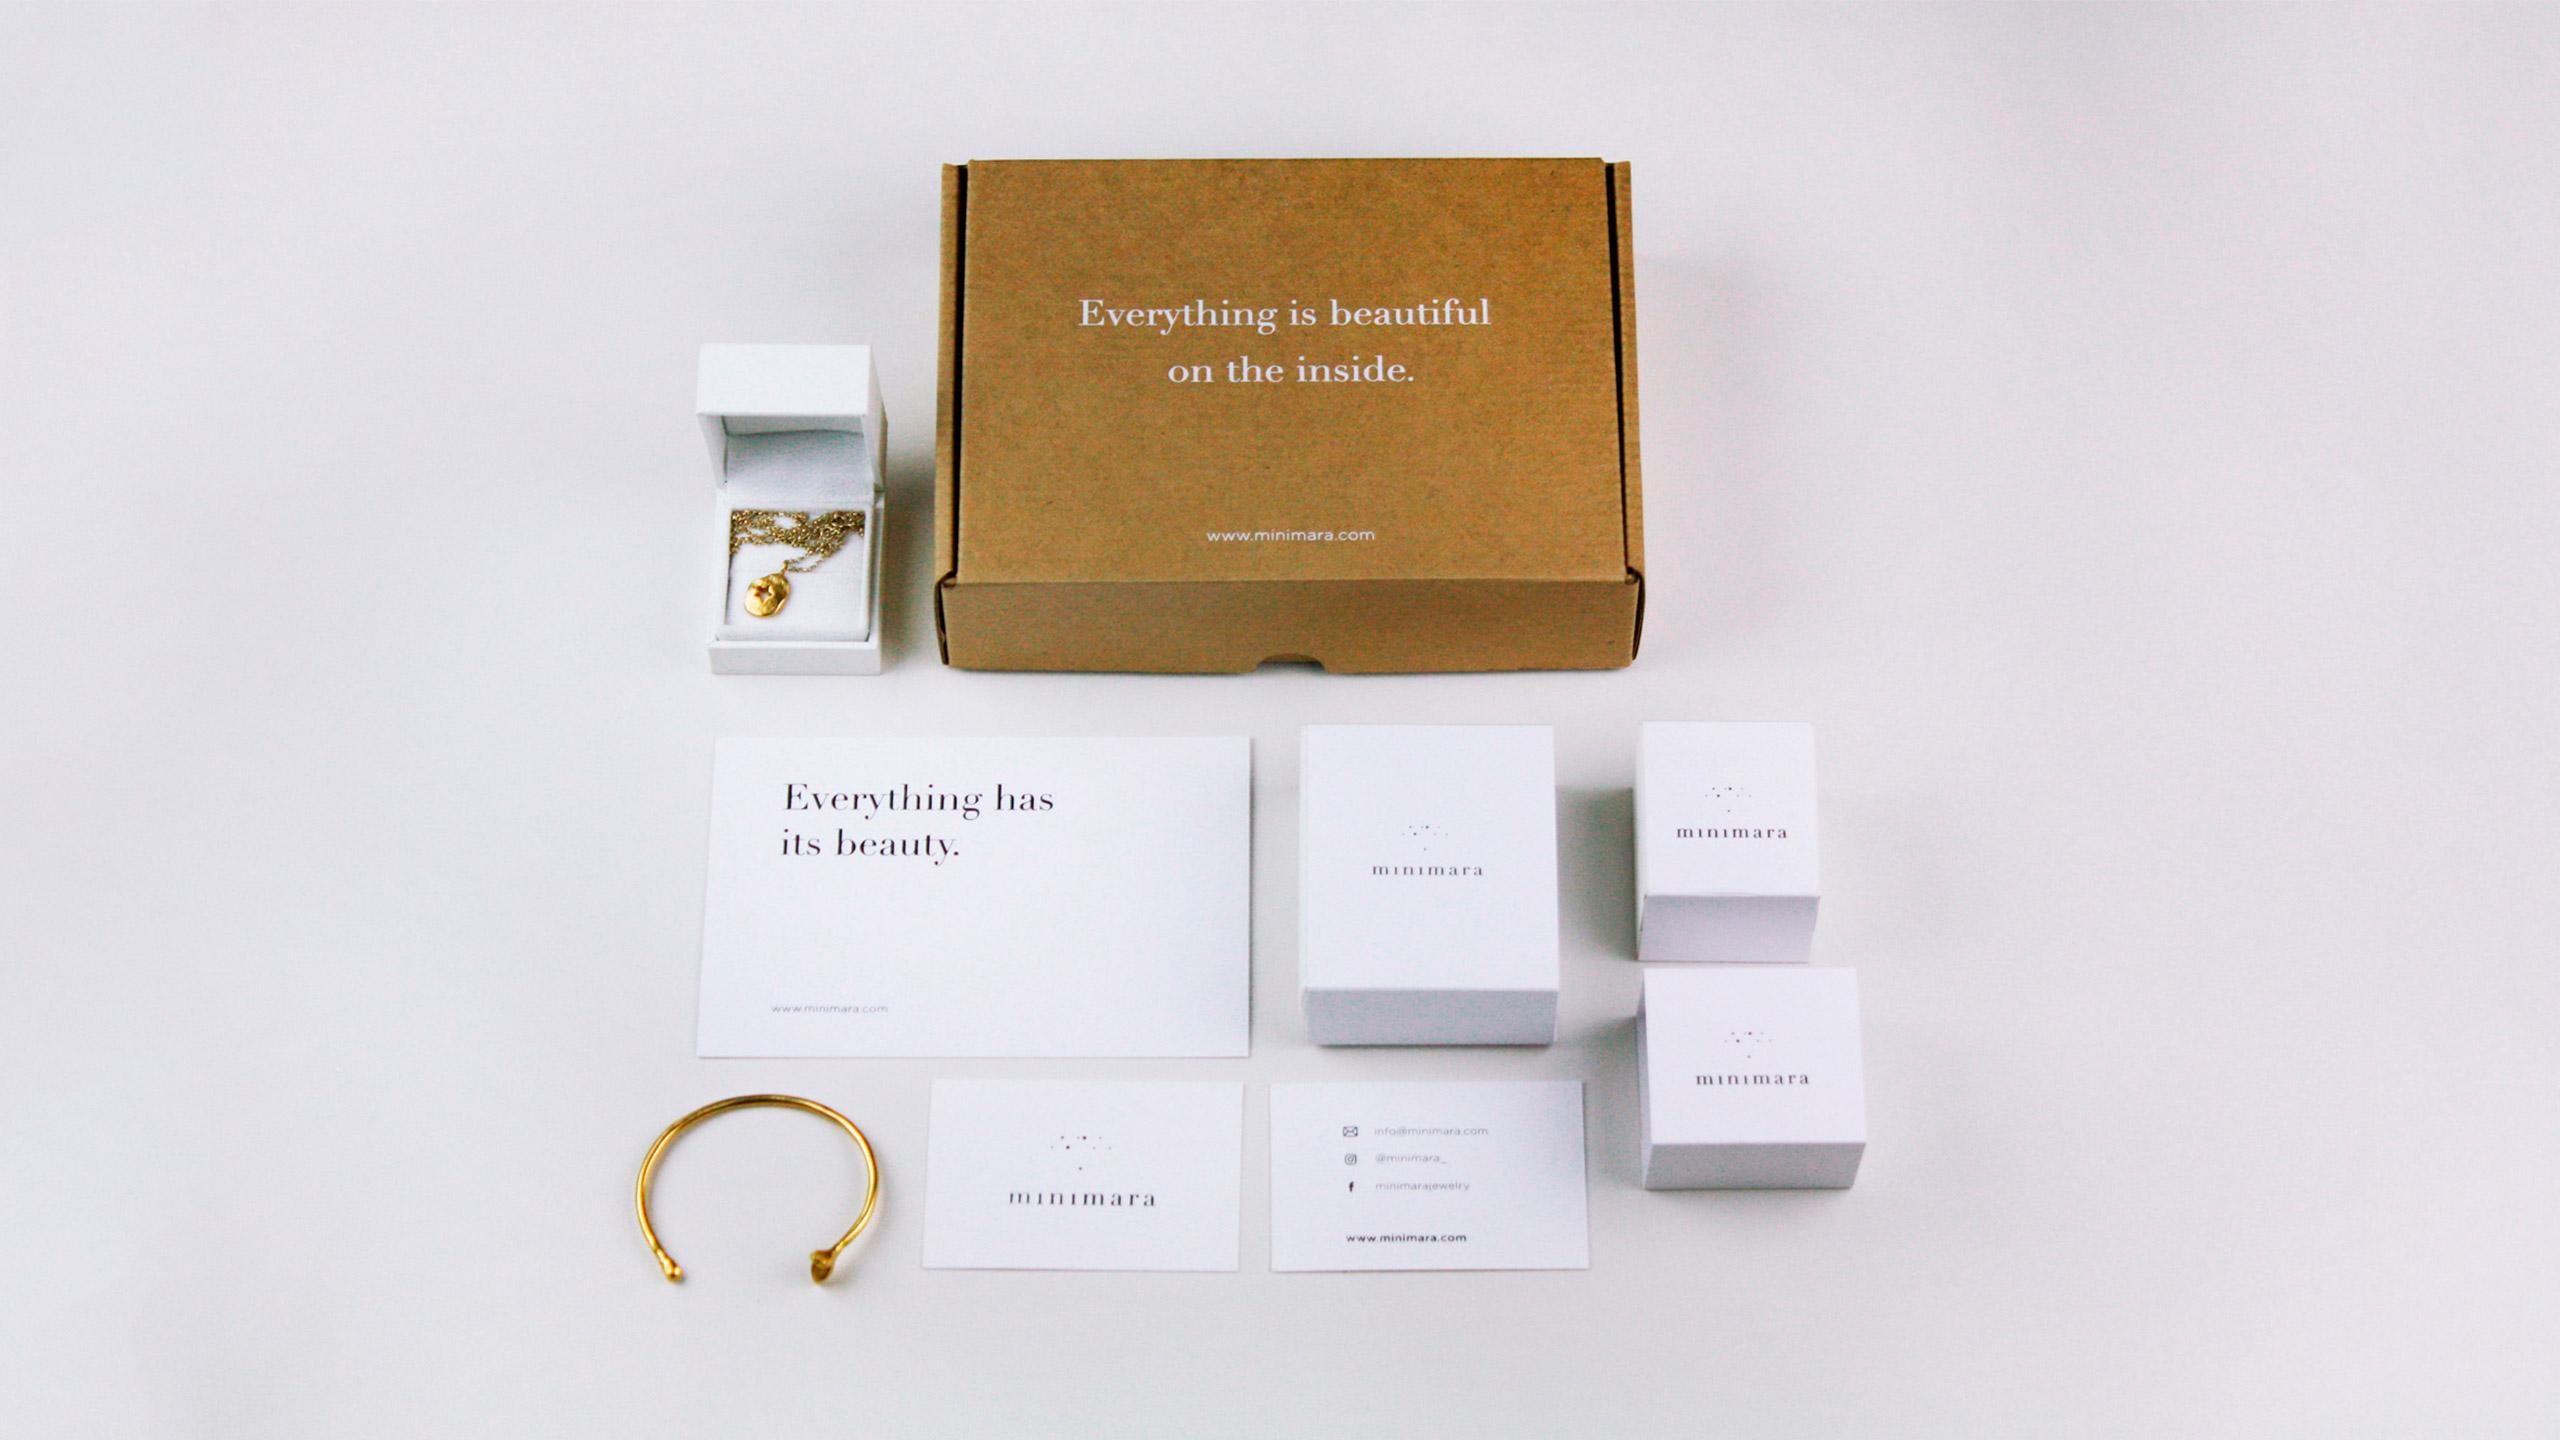 kamikaze_packaging_minimara_diseno_06